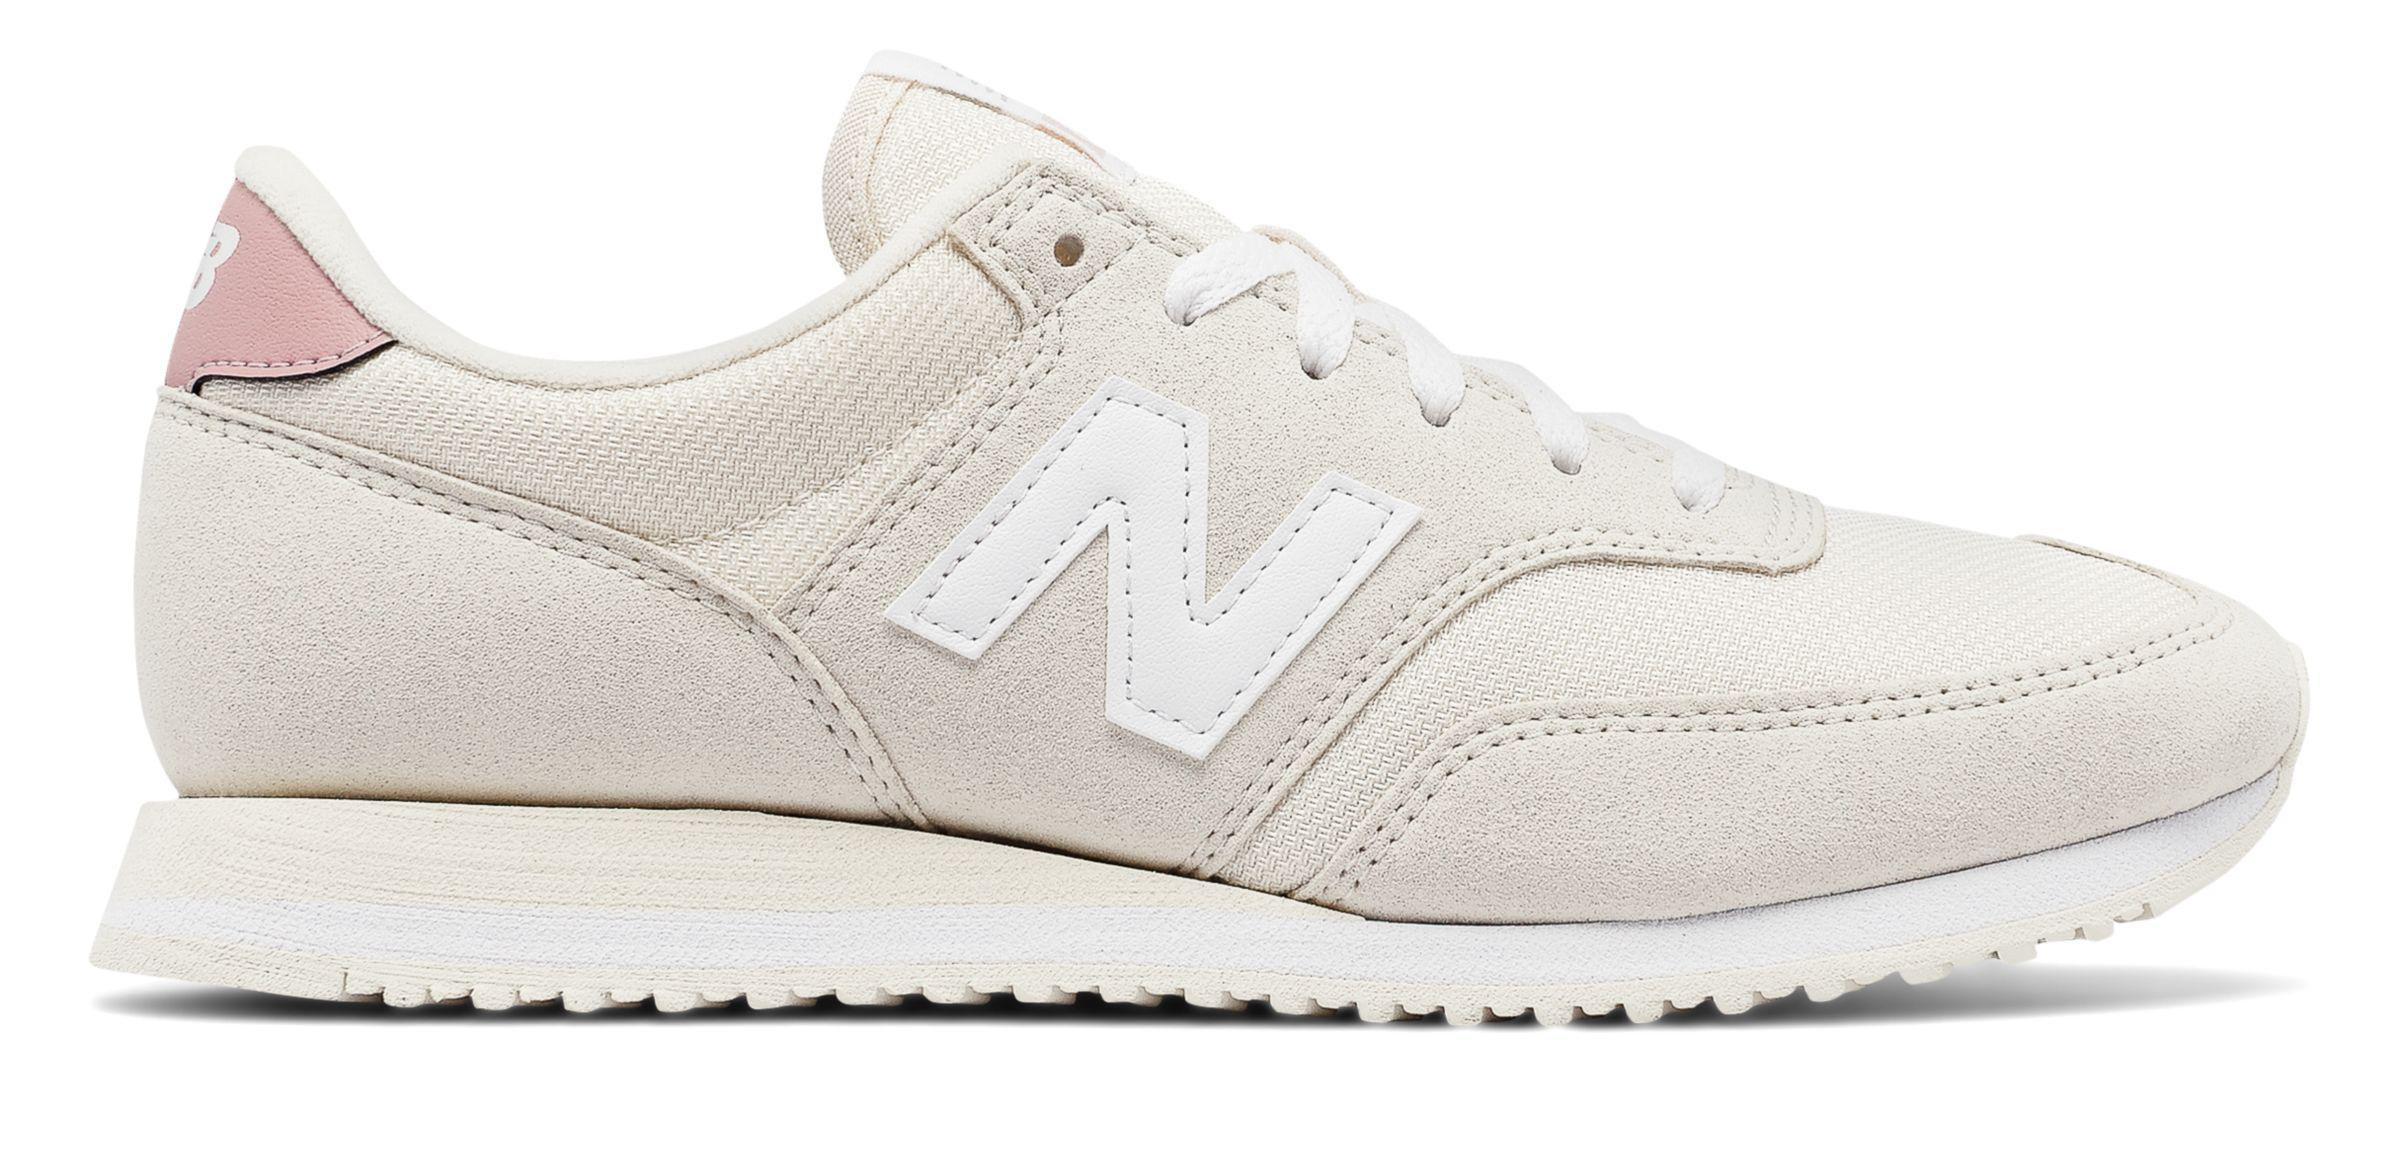 7aec0f73490e7 New Balance 620 70s Running in White - Lyst